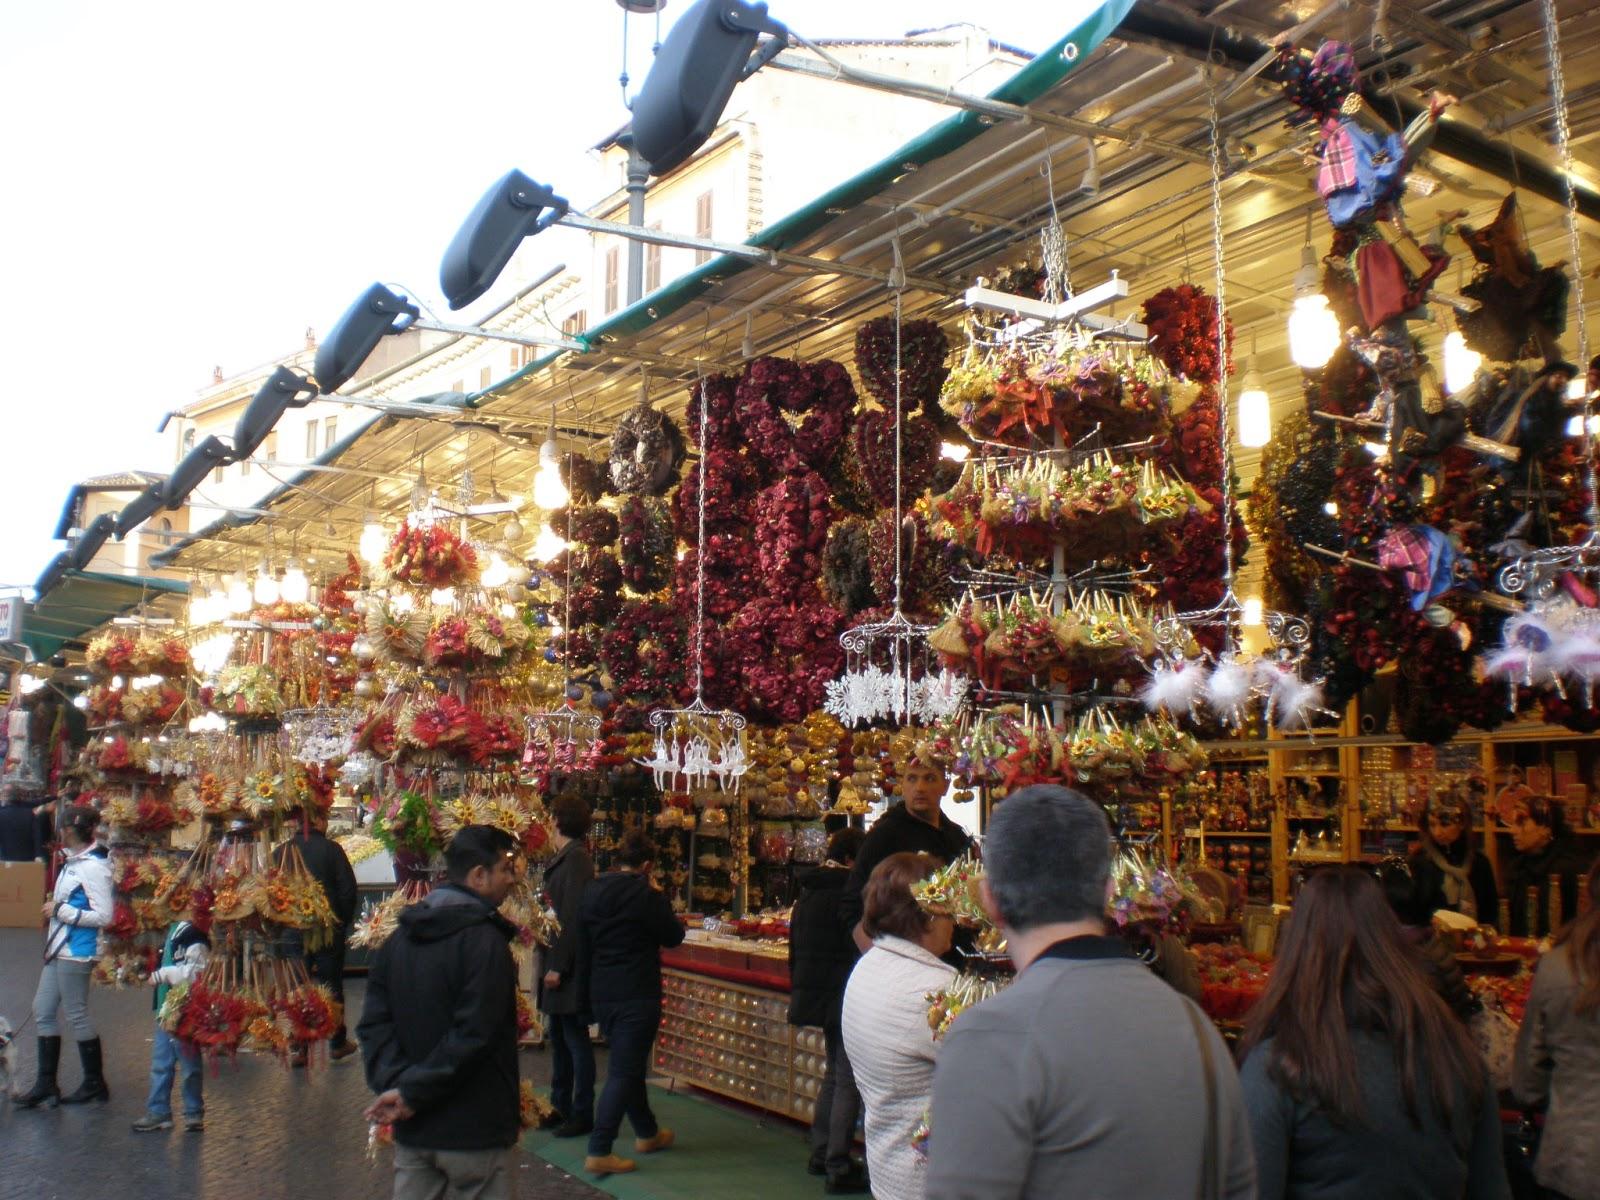 Un sardo in giro mercatini di natale a roma for Mercatini antiquariato roma